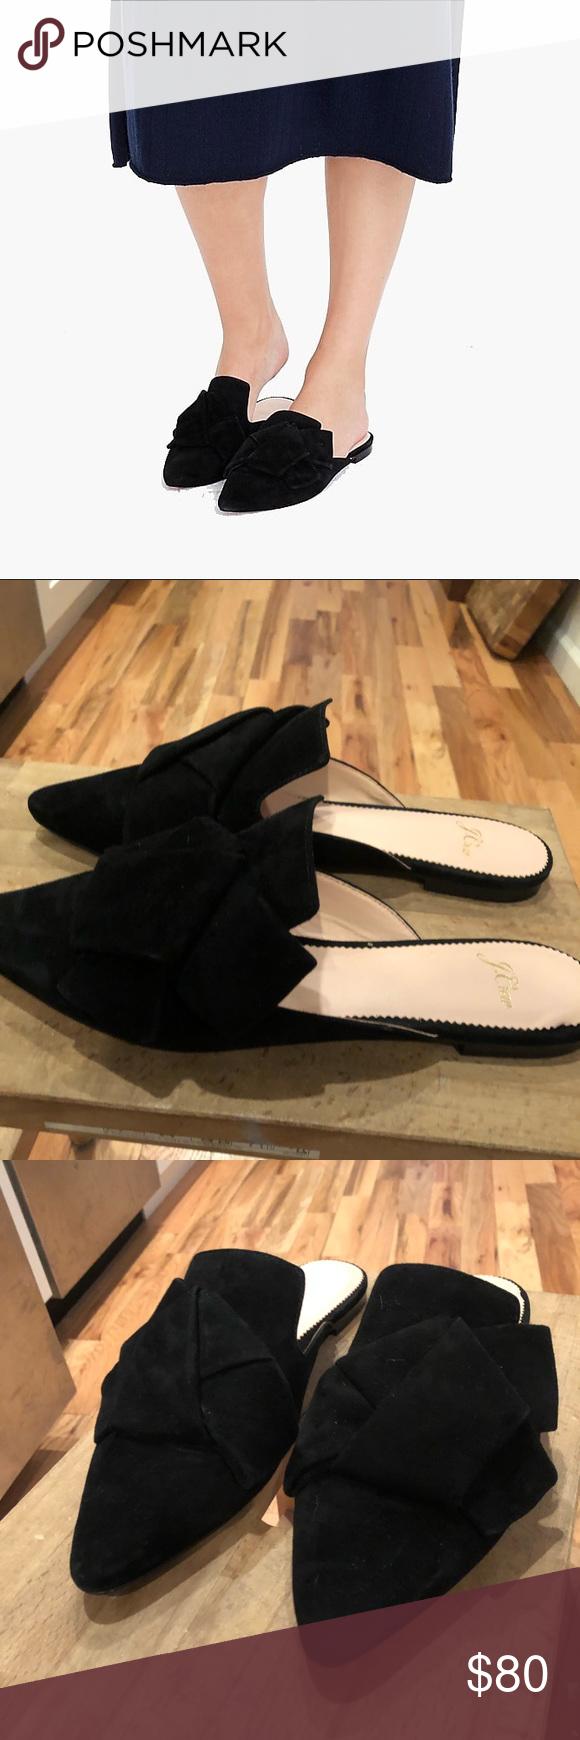 Pointed toe slides in suede Black suede